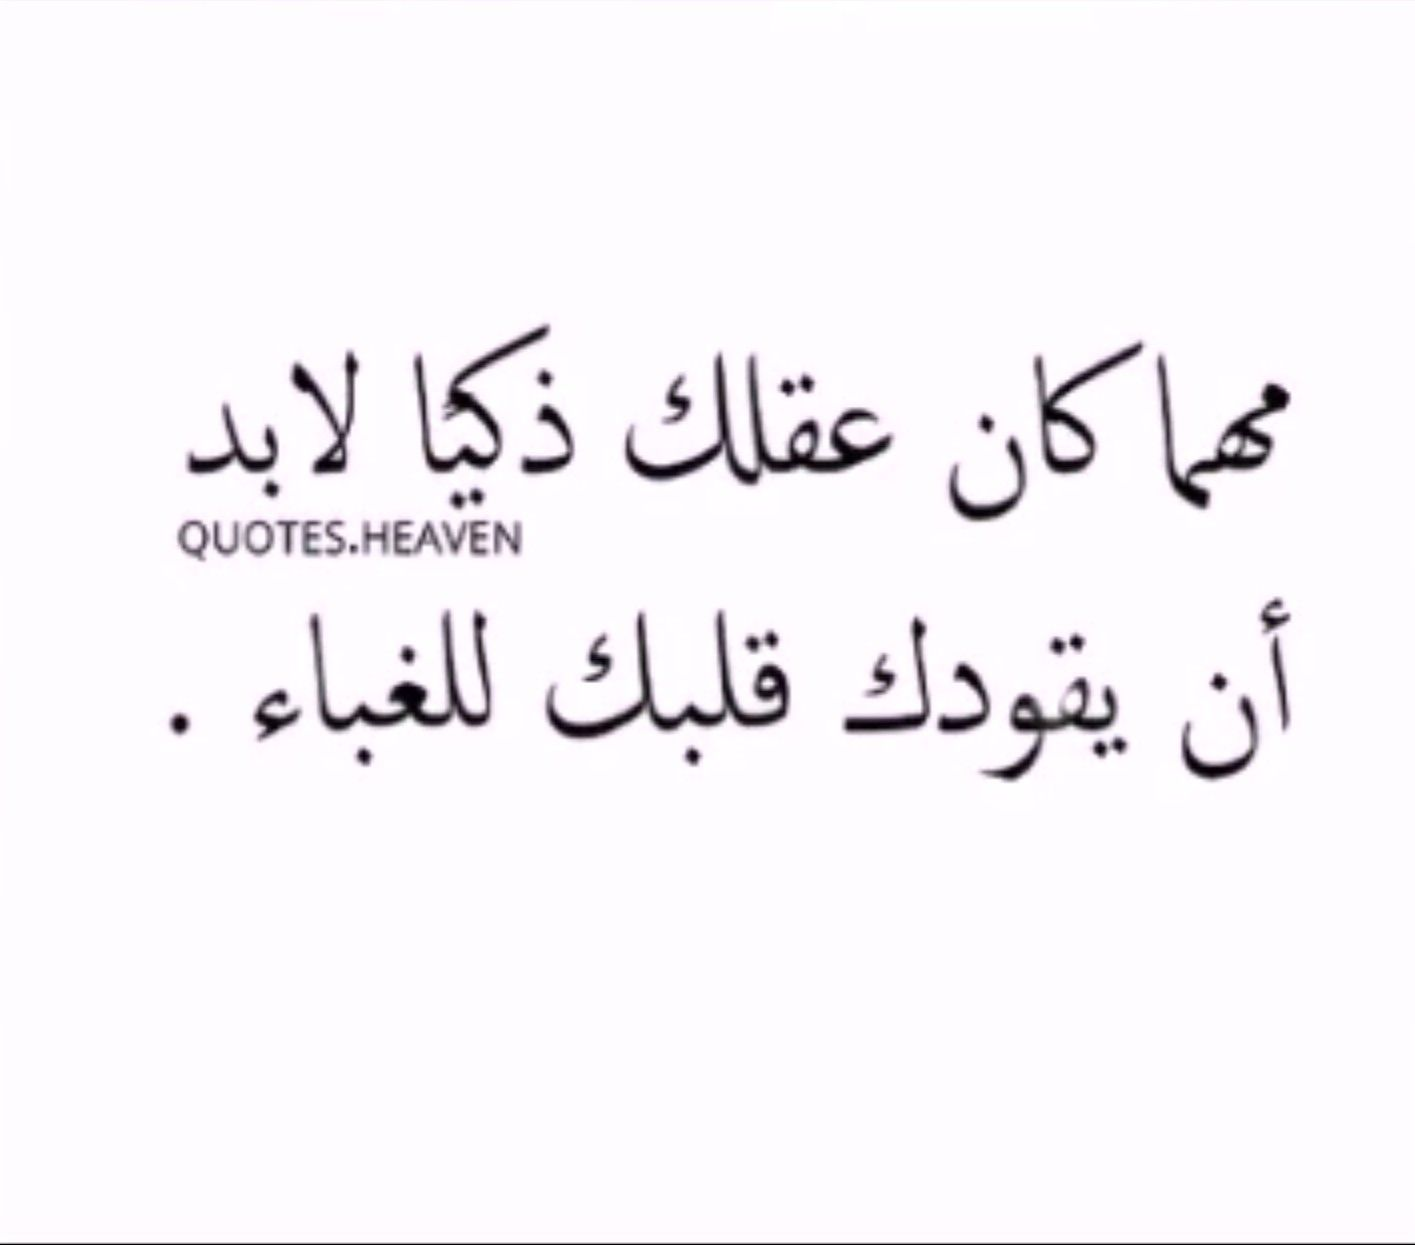 Ay Walla Quotations Life Quotes Quotes